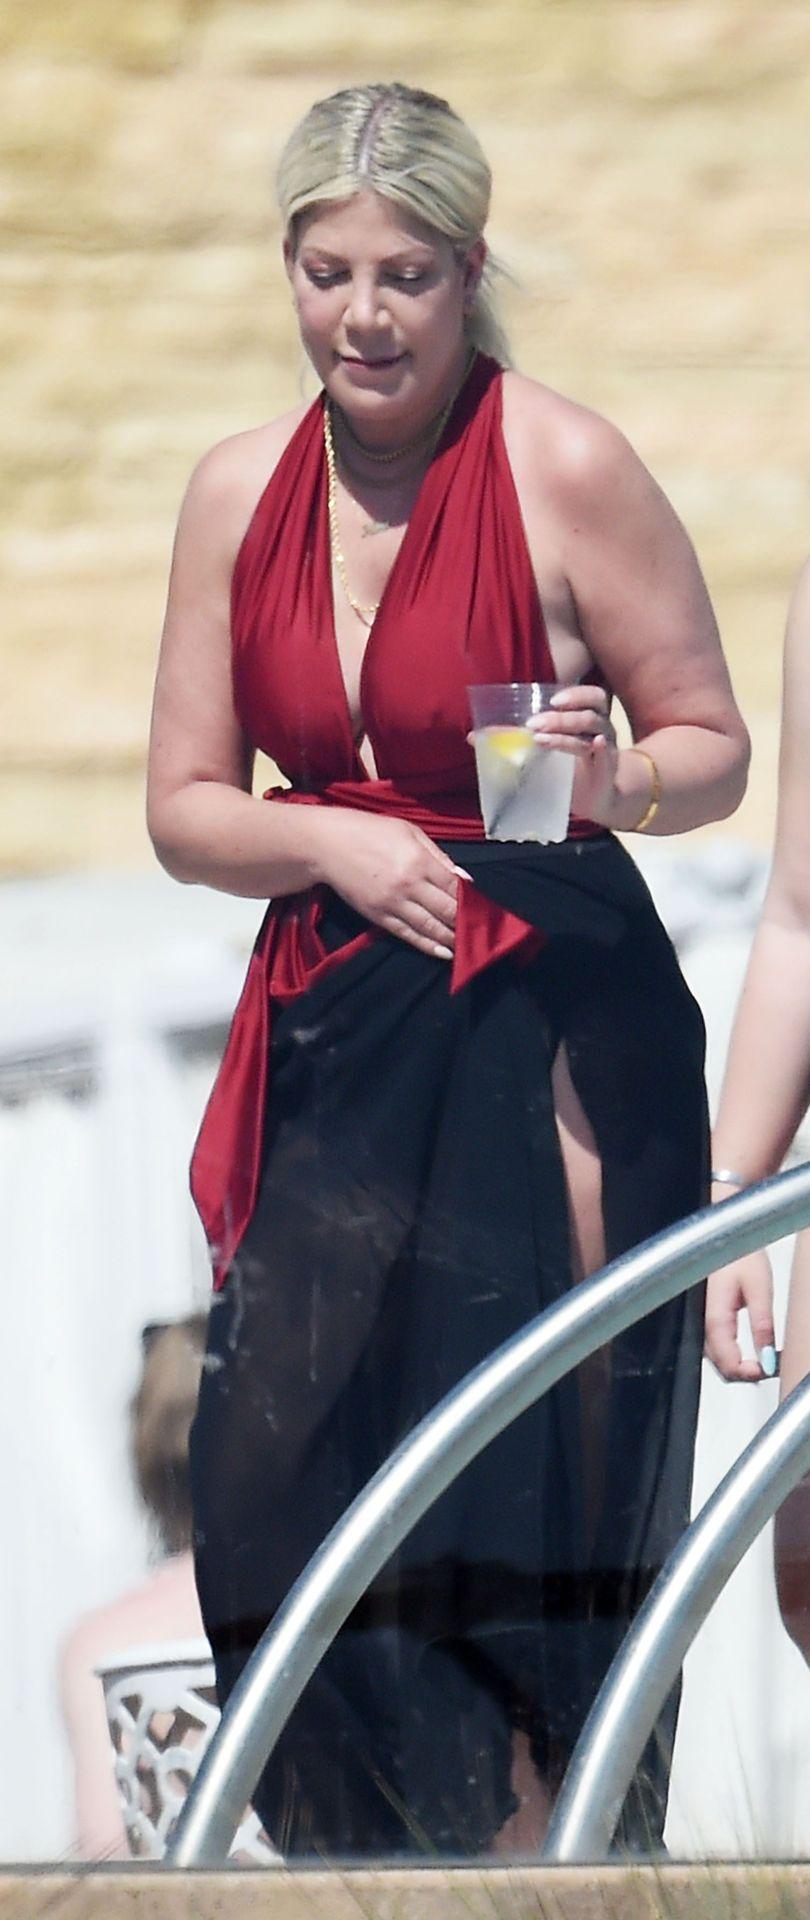 Tori Spelling Slips Into Her Swimsuit with Dean McDermott (46 Photos)